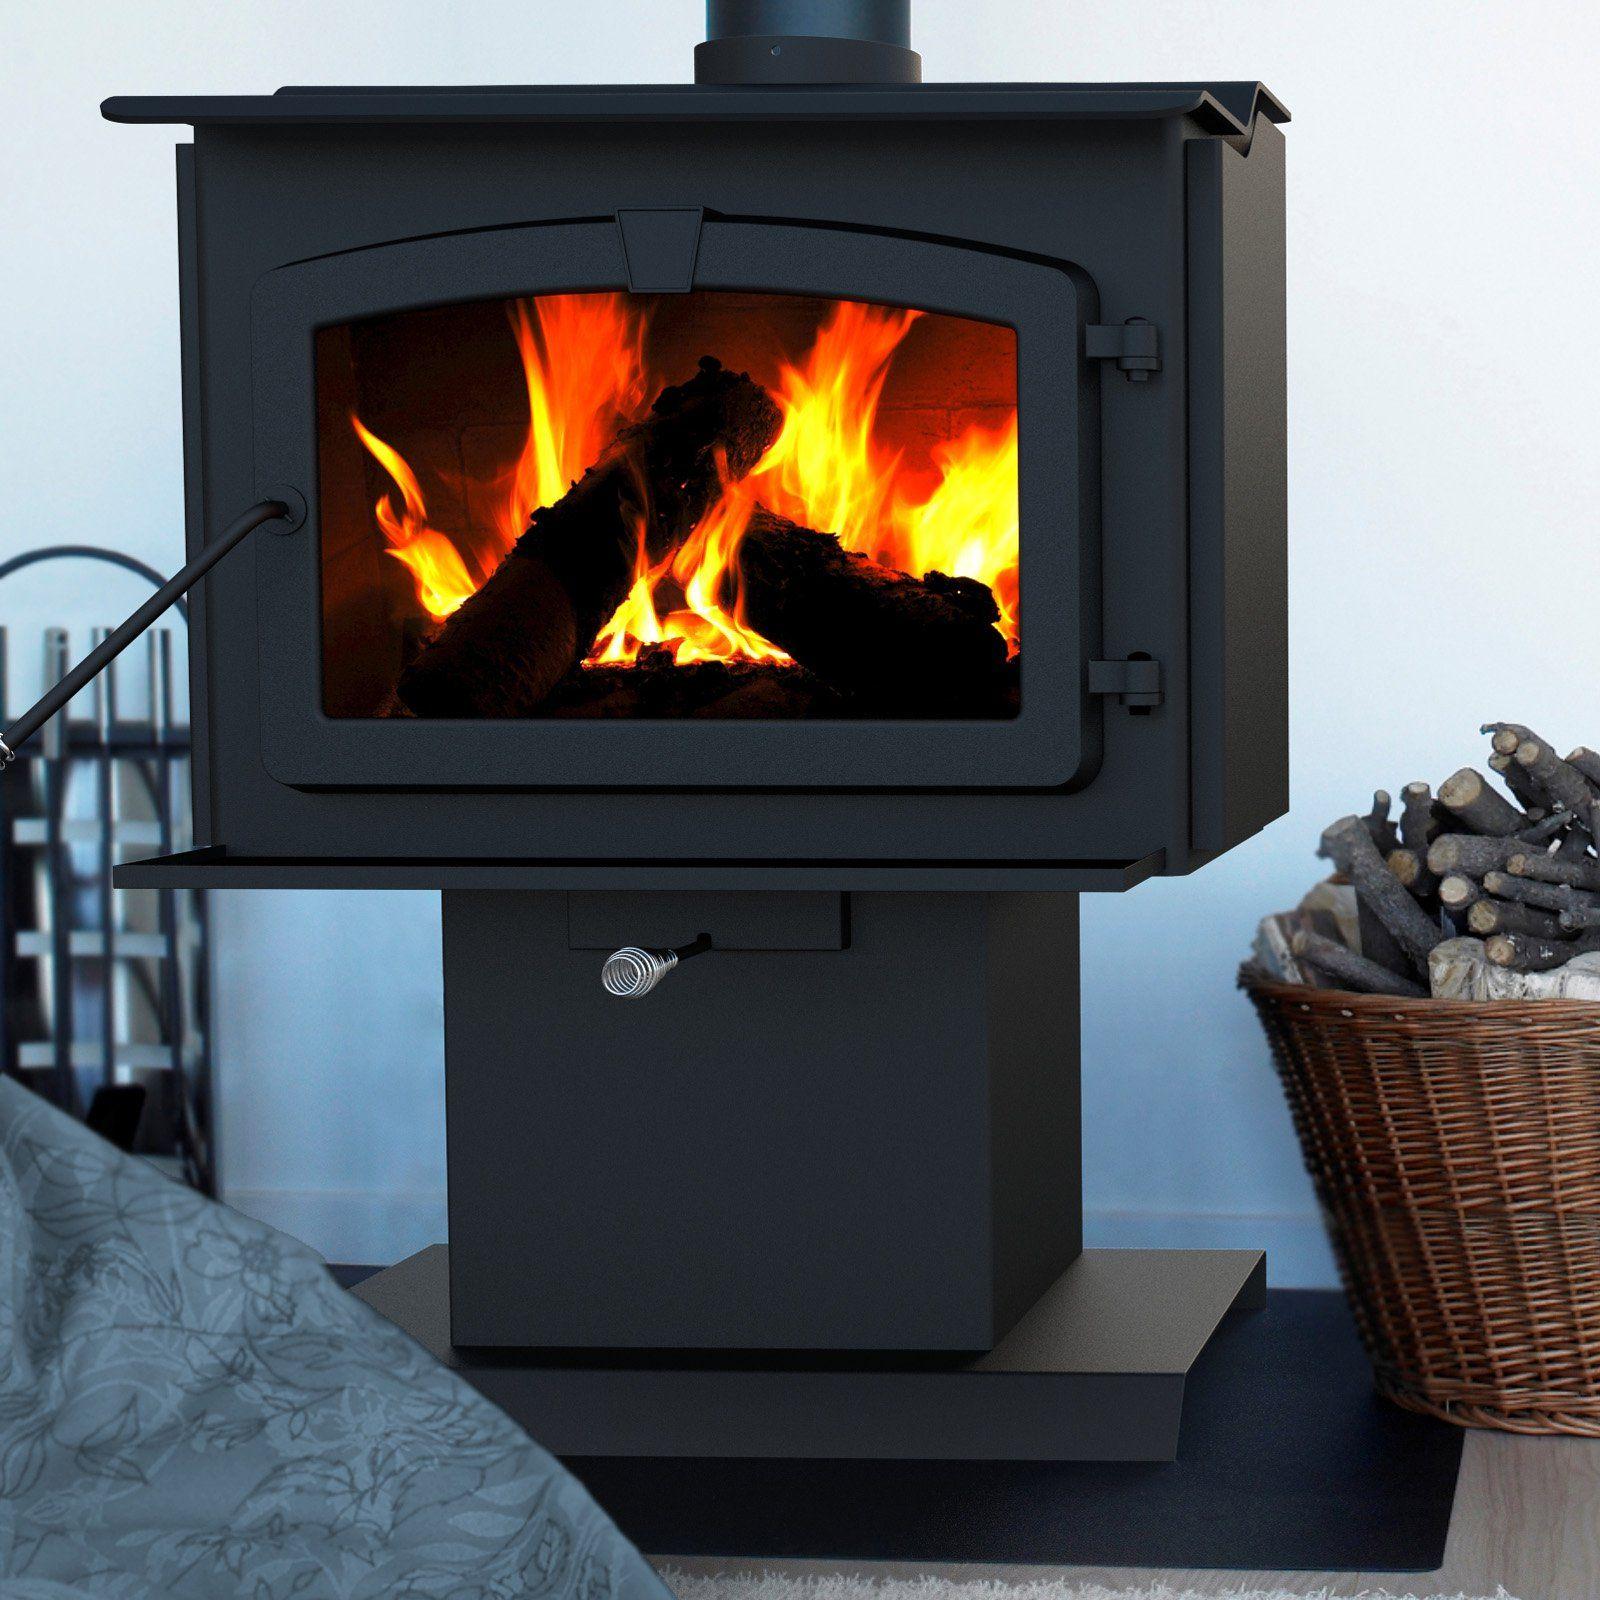 pleasant hearth small wood burning stove black 3 oaks farmhouse rh pinterest com